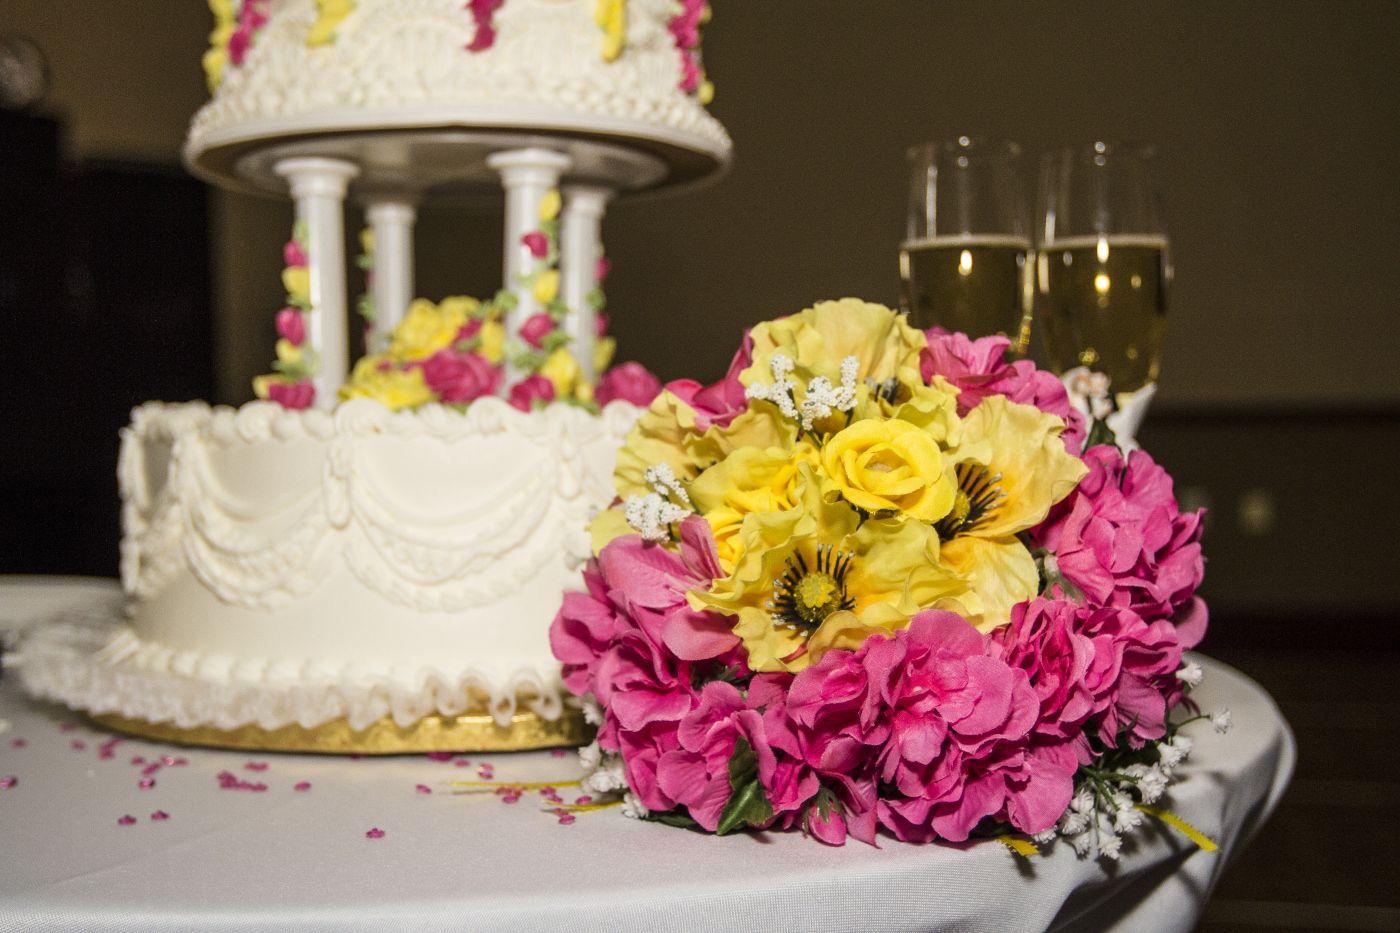 Jaikaran wedding publix wedding cake if your familiar